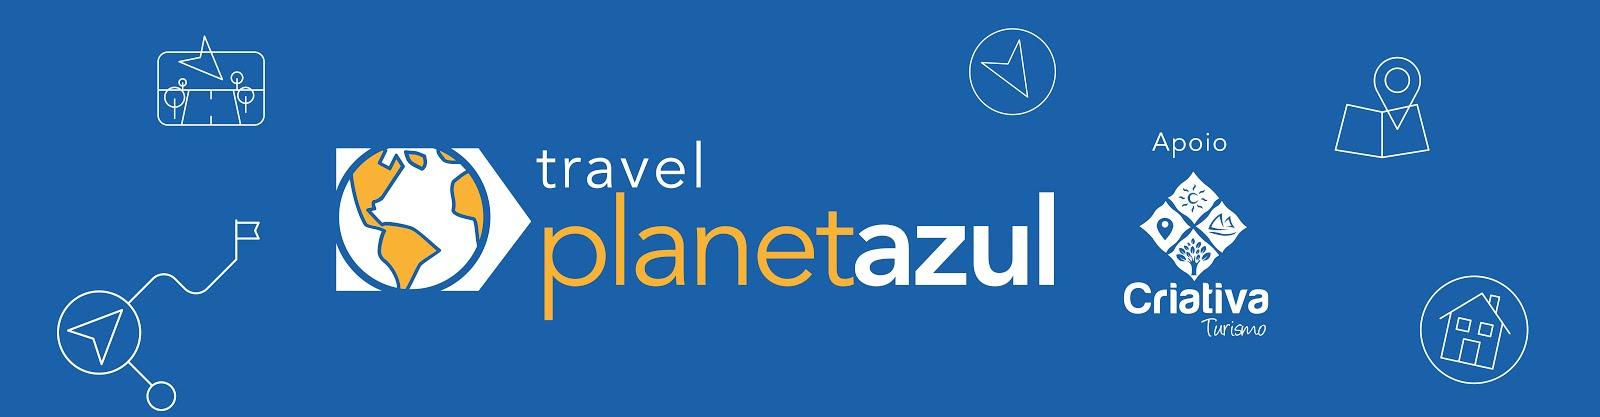 Travel Planet Azul